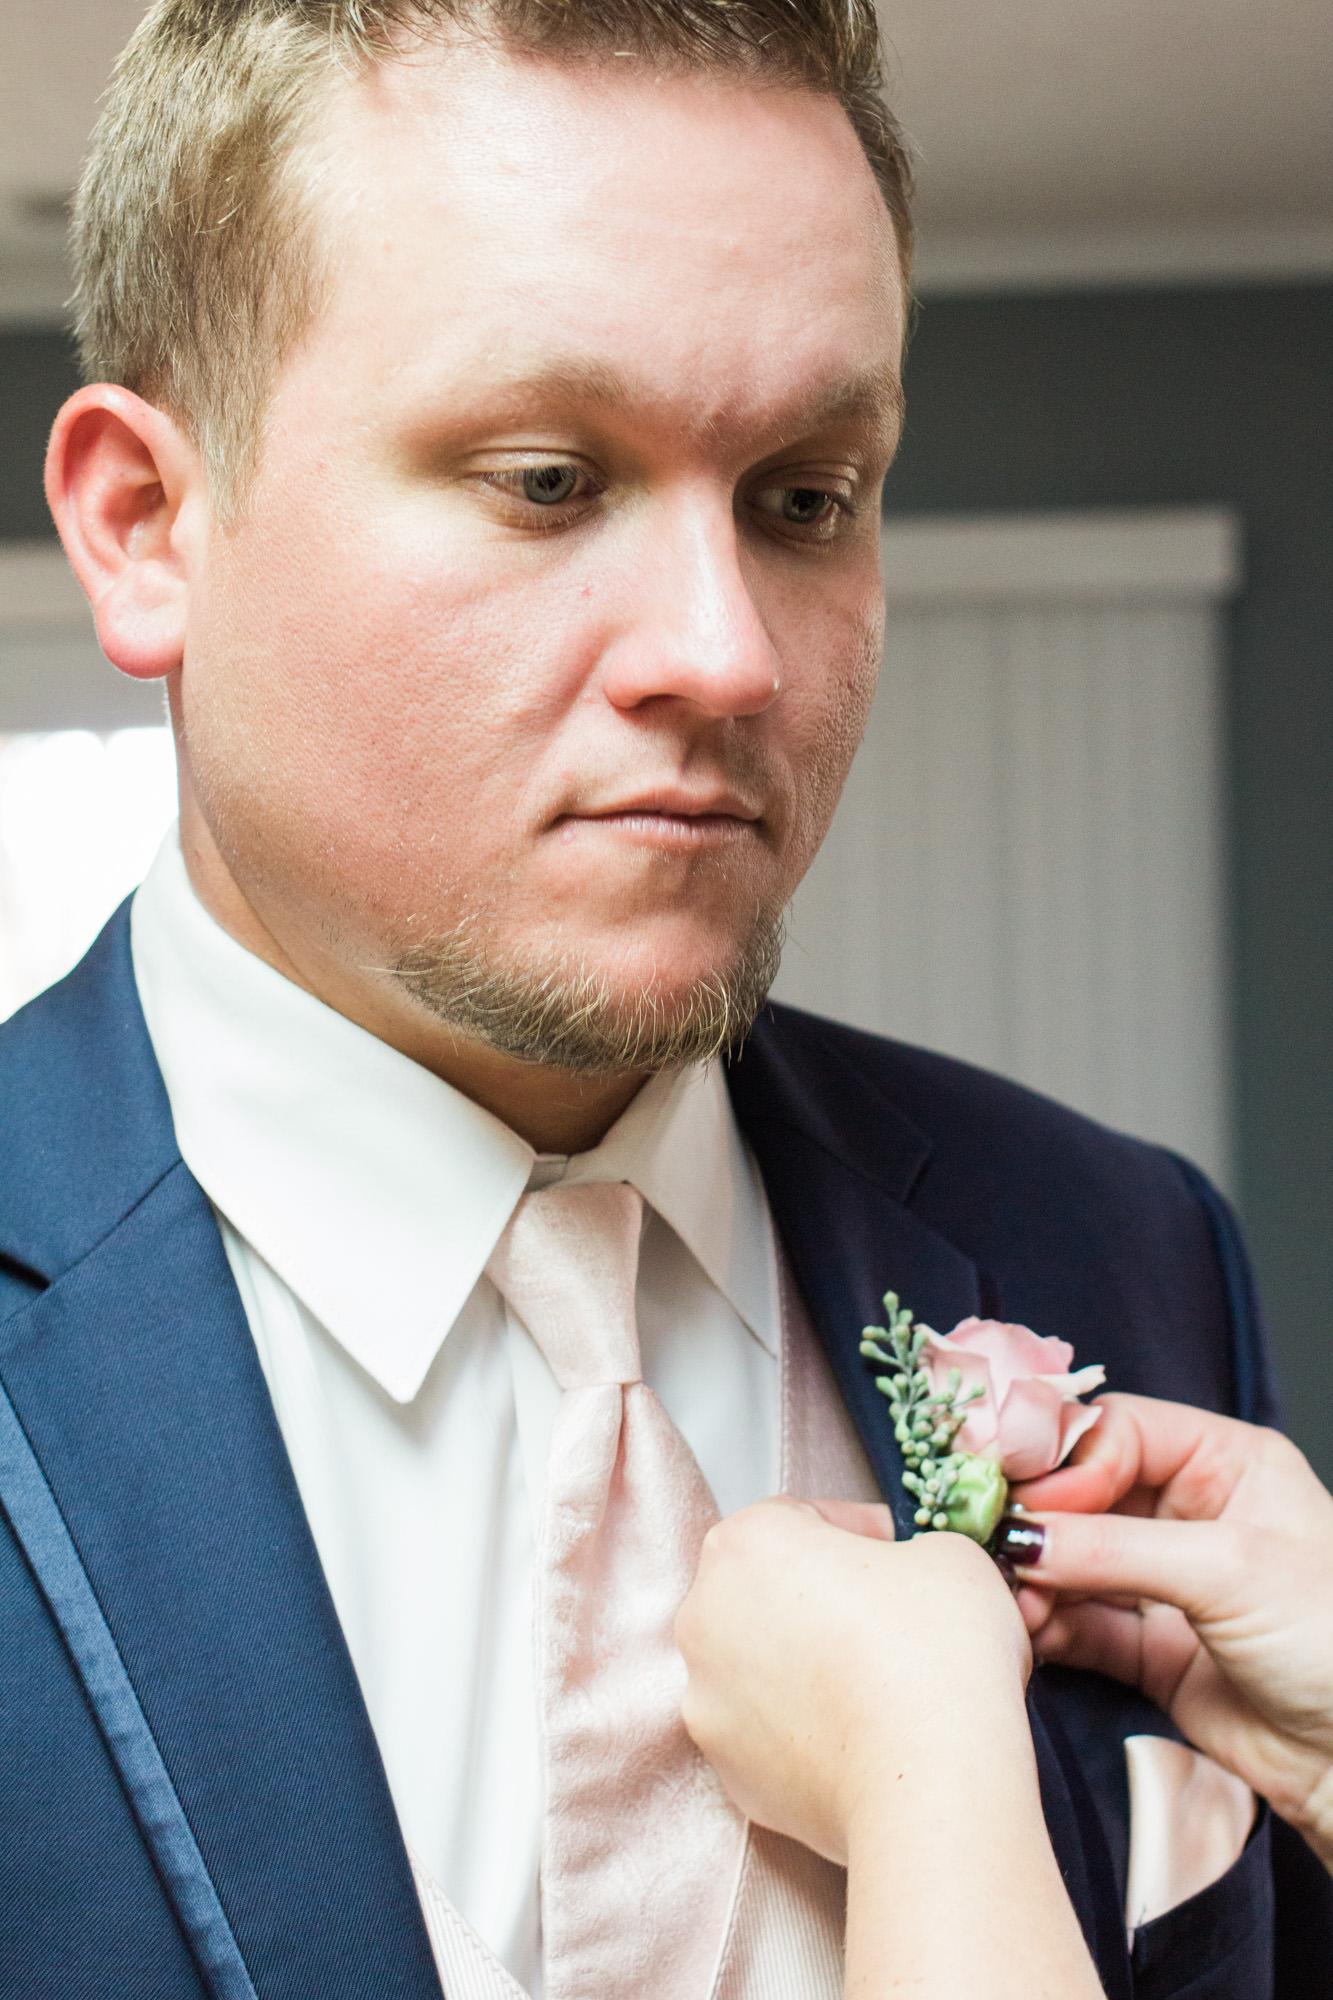 georgia-wedding-groom-4.jpg